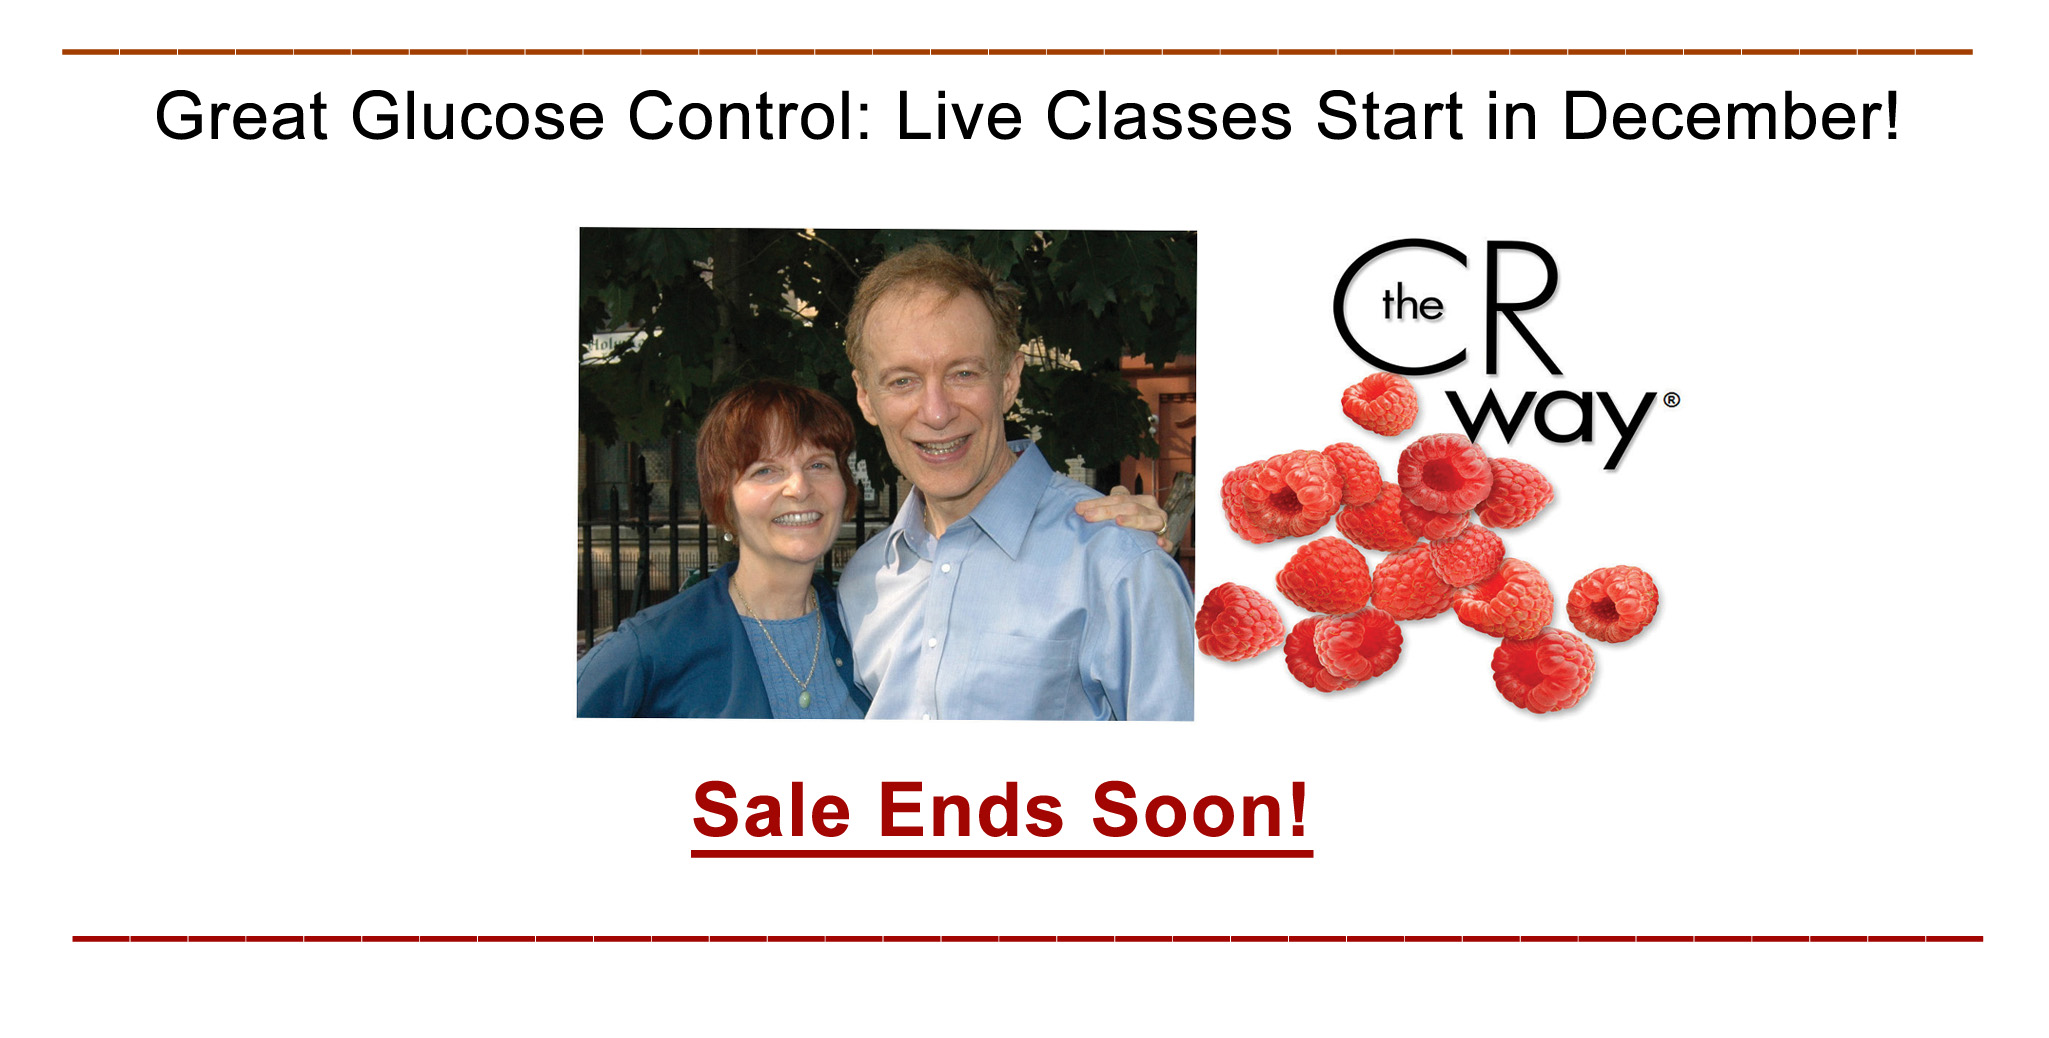 p-m-great-glucose-control-november-sale-ends-soon-.jpg